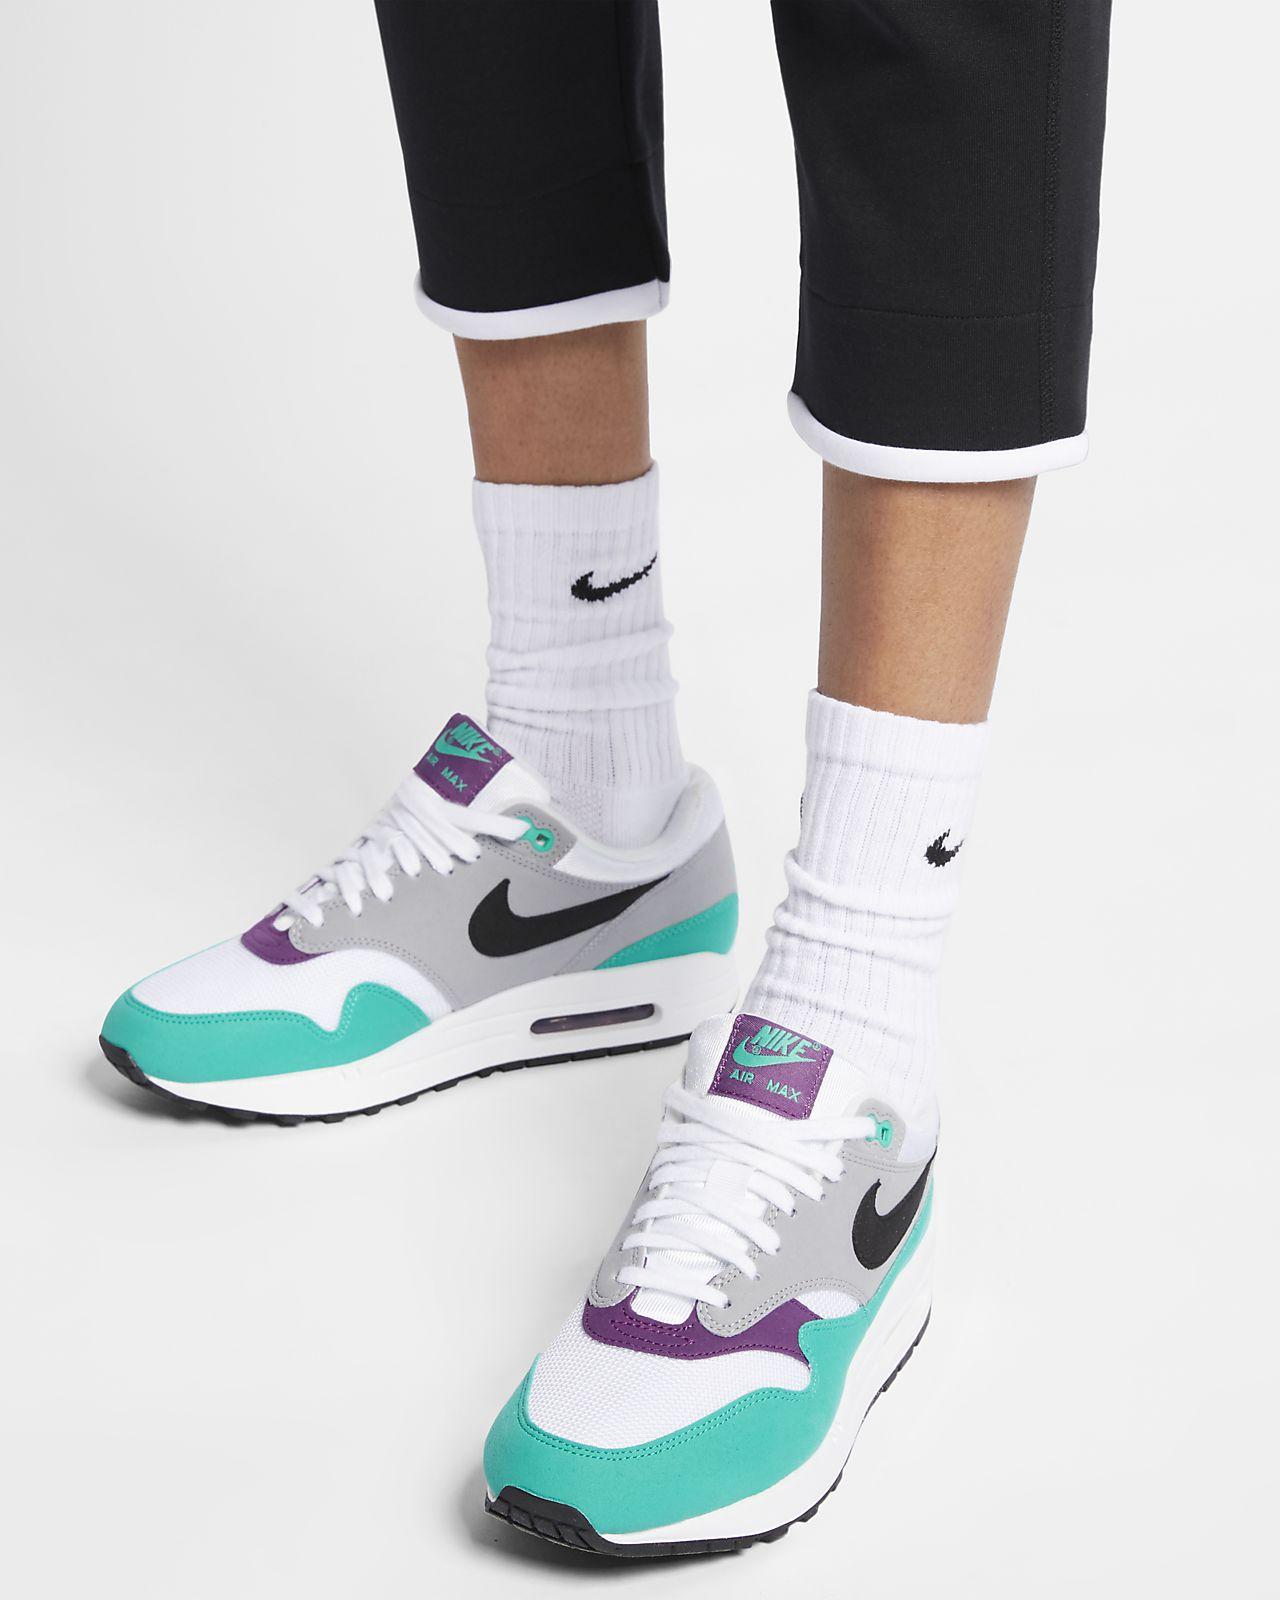 3ac7b7eca53d Nike Sportswear Tech Fleece Women s Pants. Nike.com